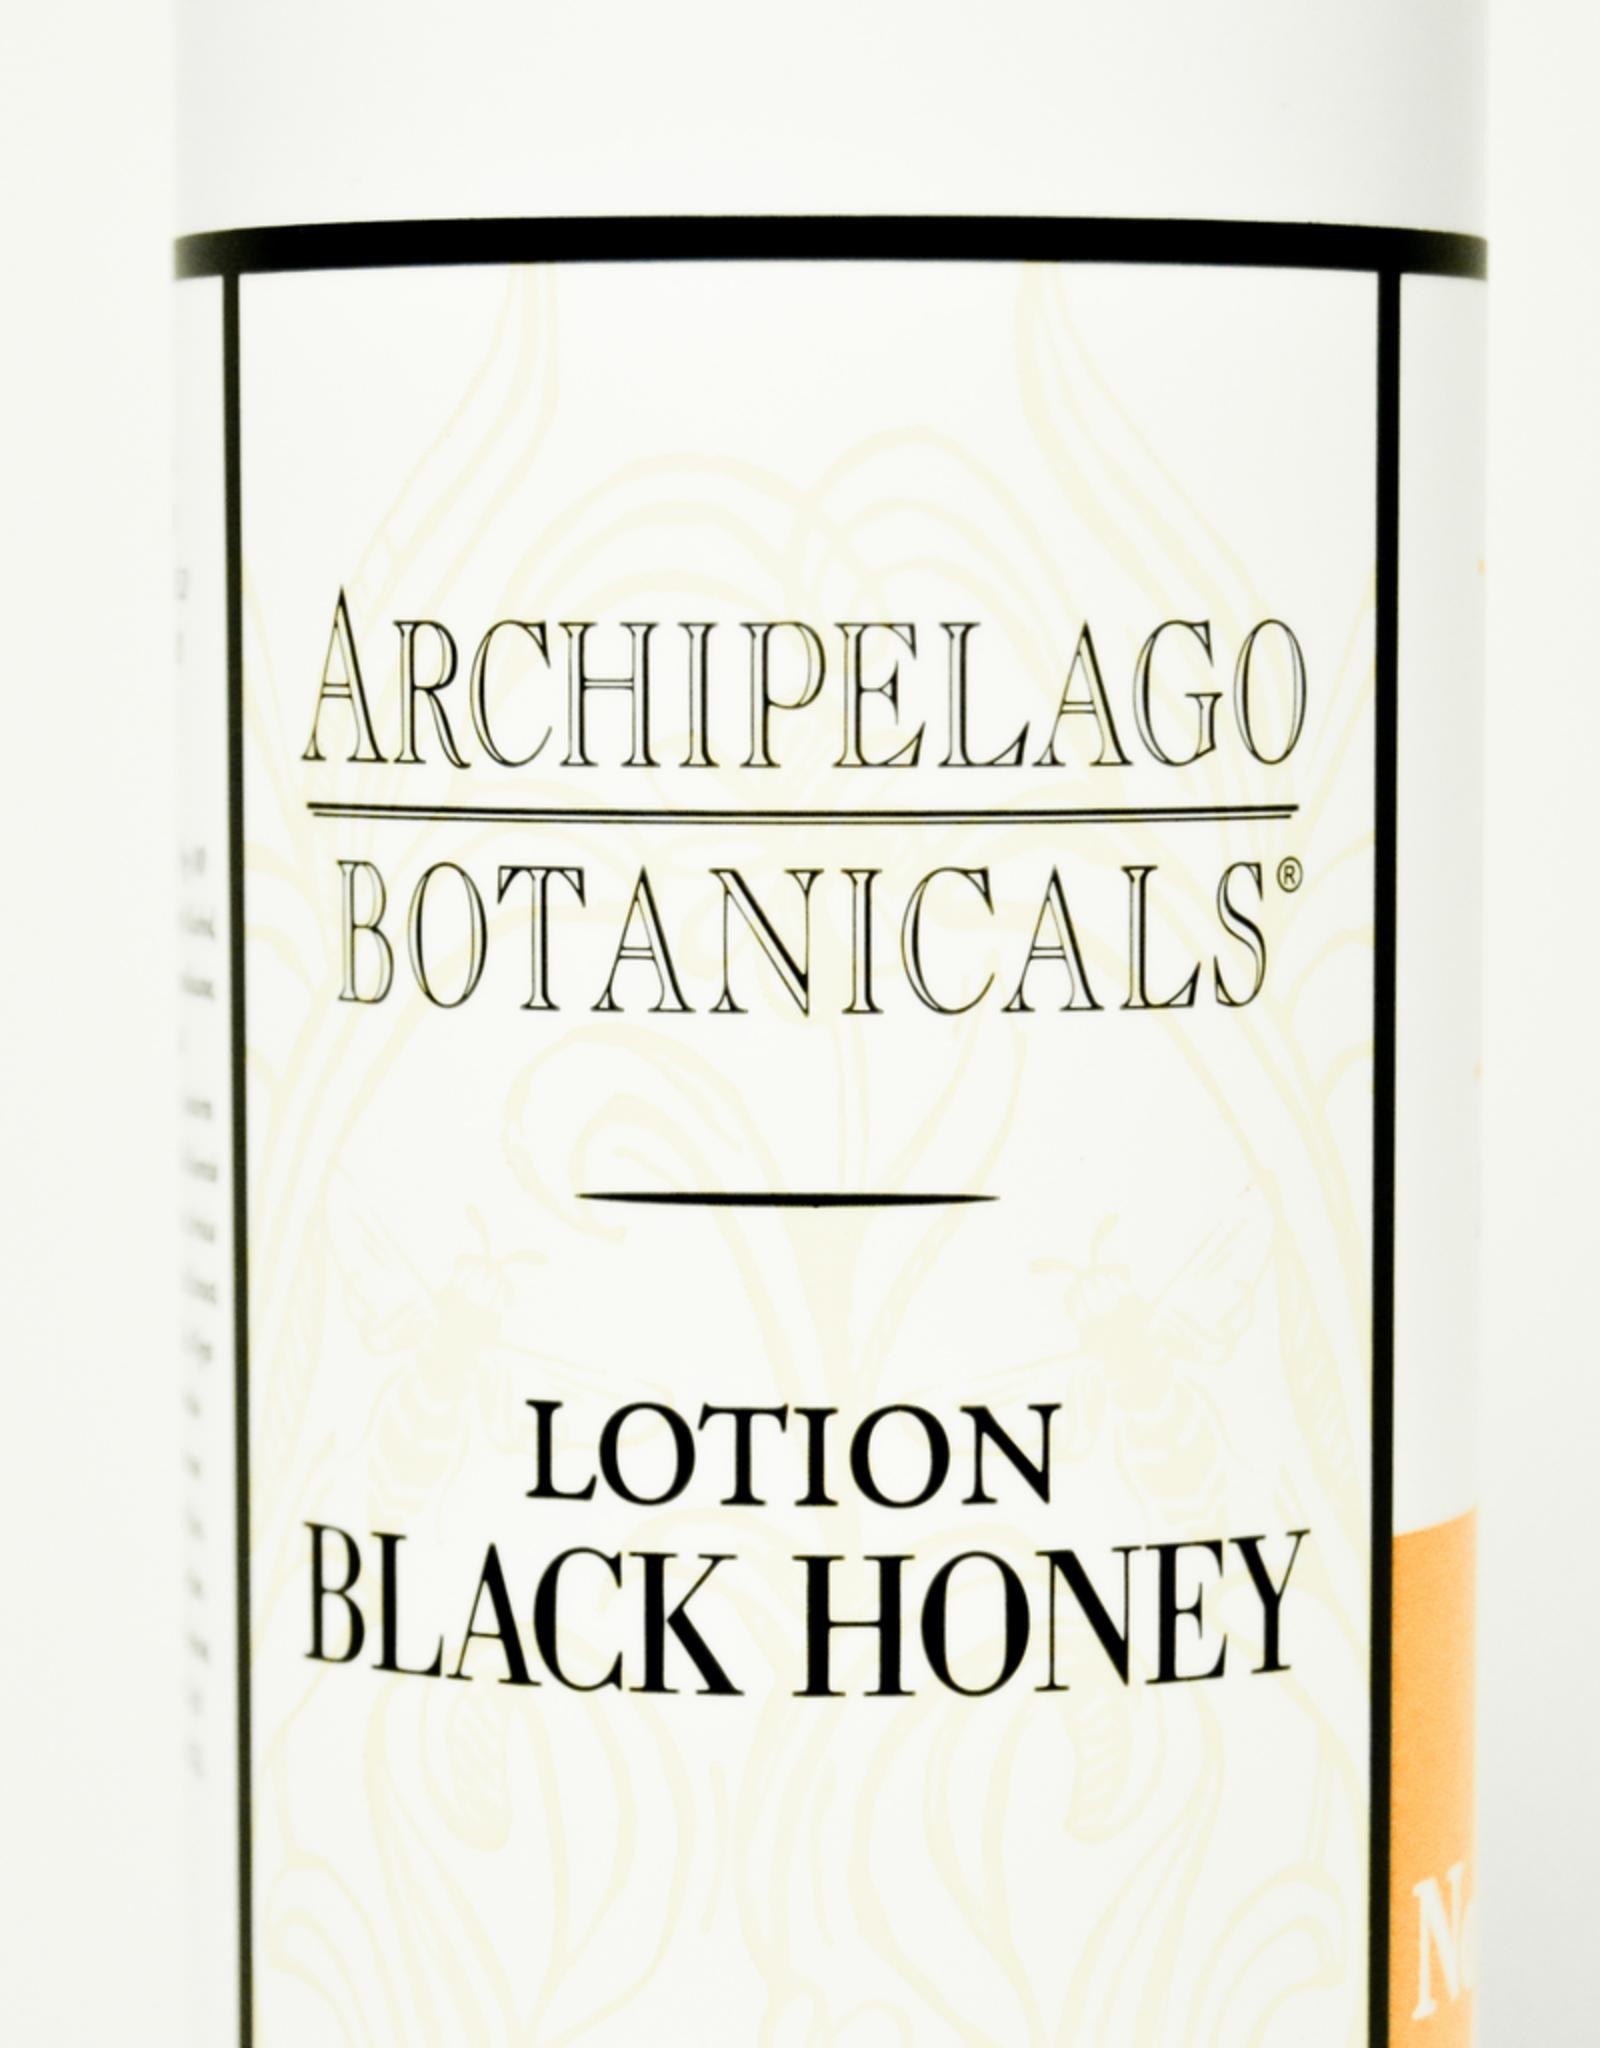 18oz Black Honey Lotion